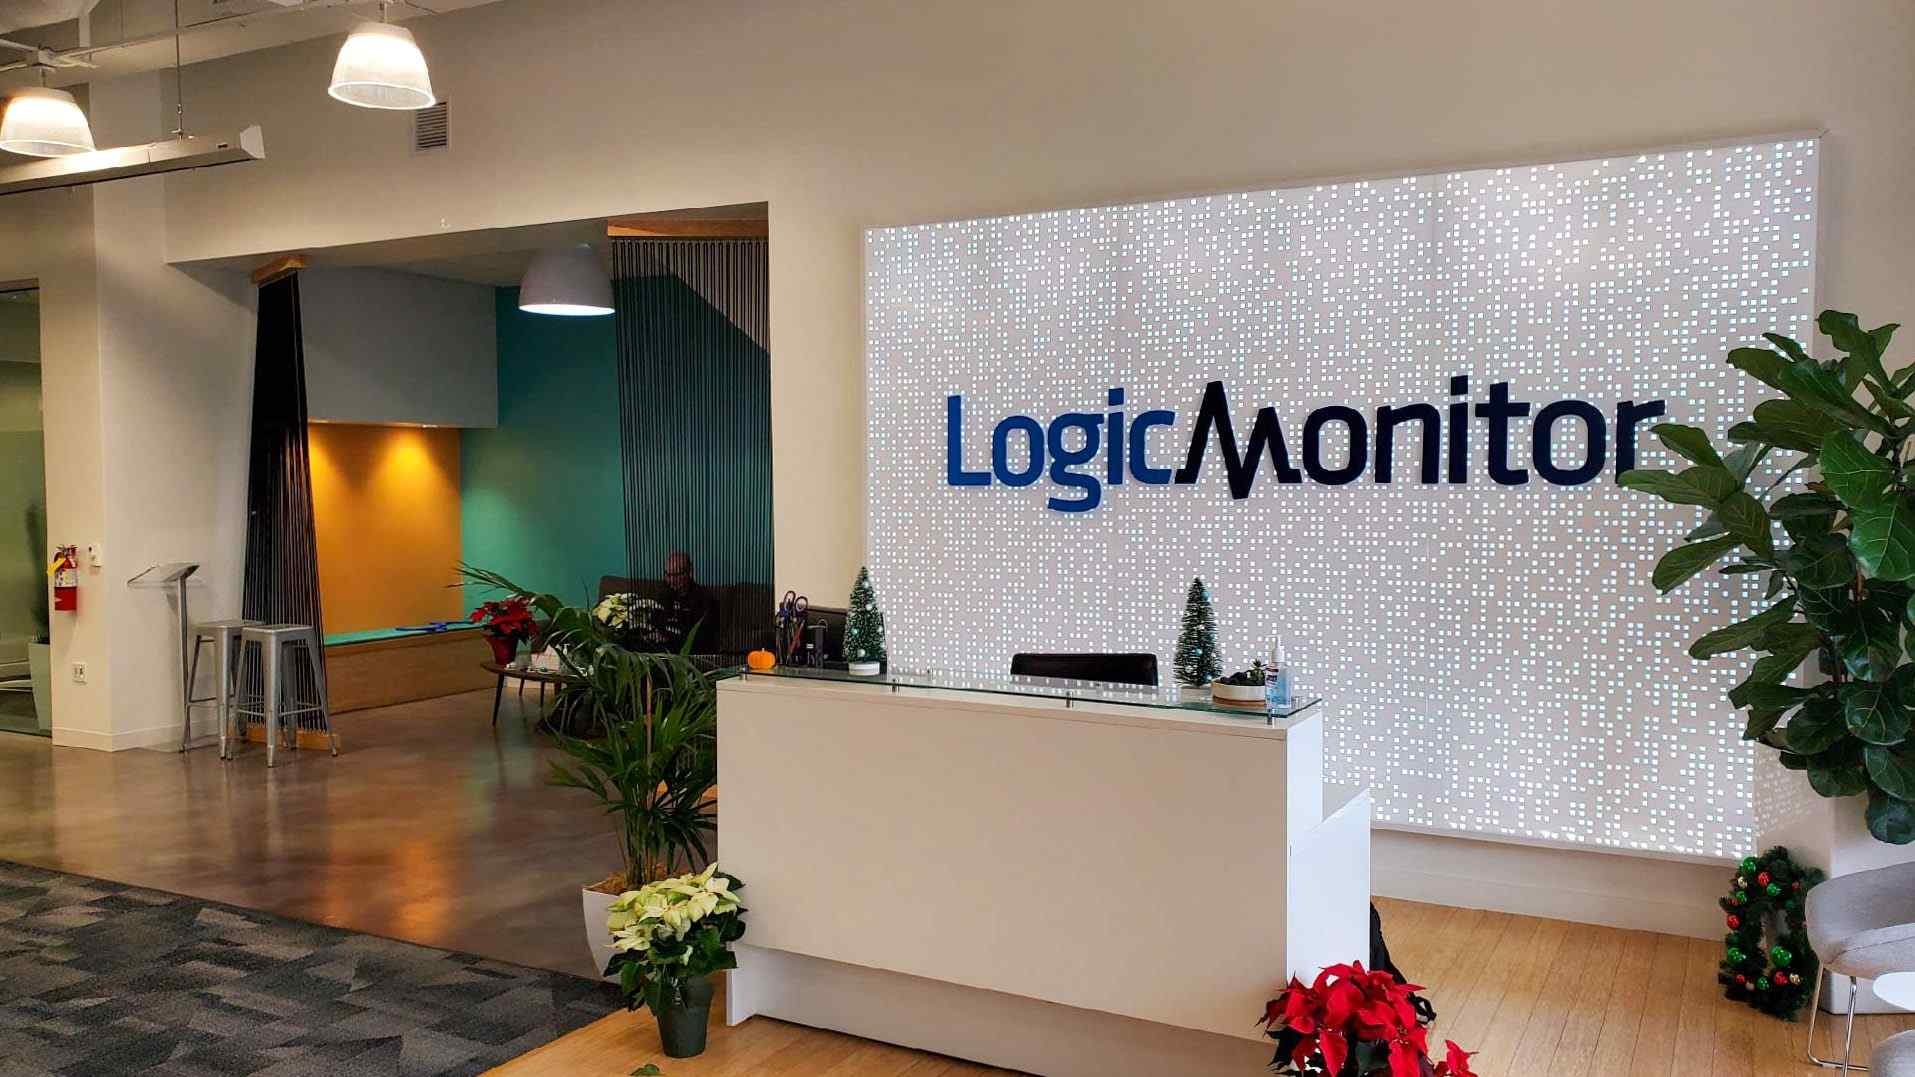 Logic Monitor